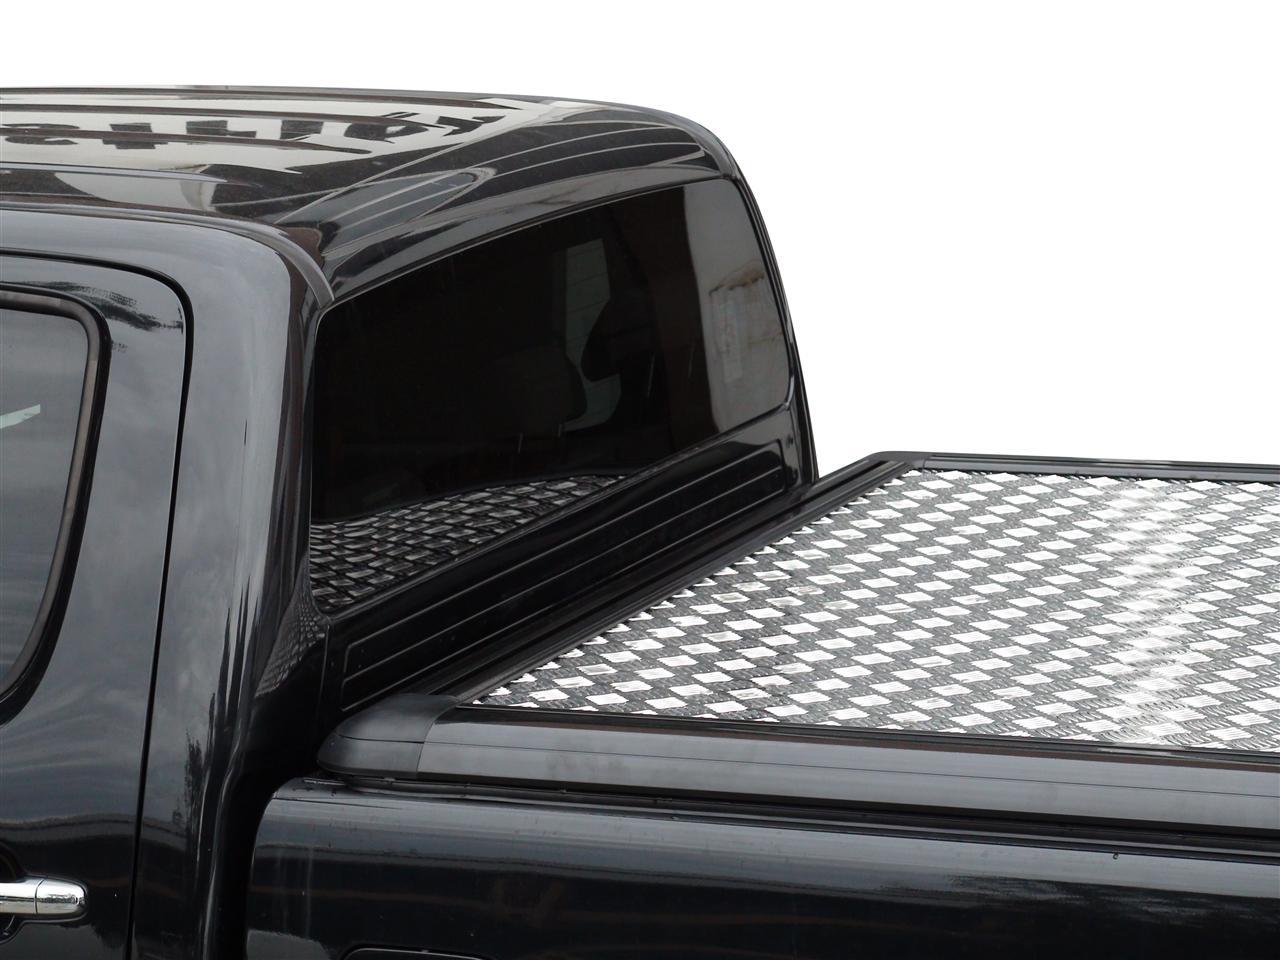 Evo119 Upstone Aluminium Tonneau Cover Toyota Hilux